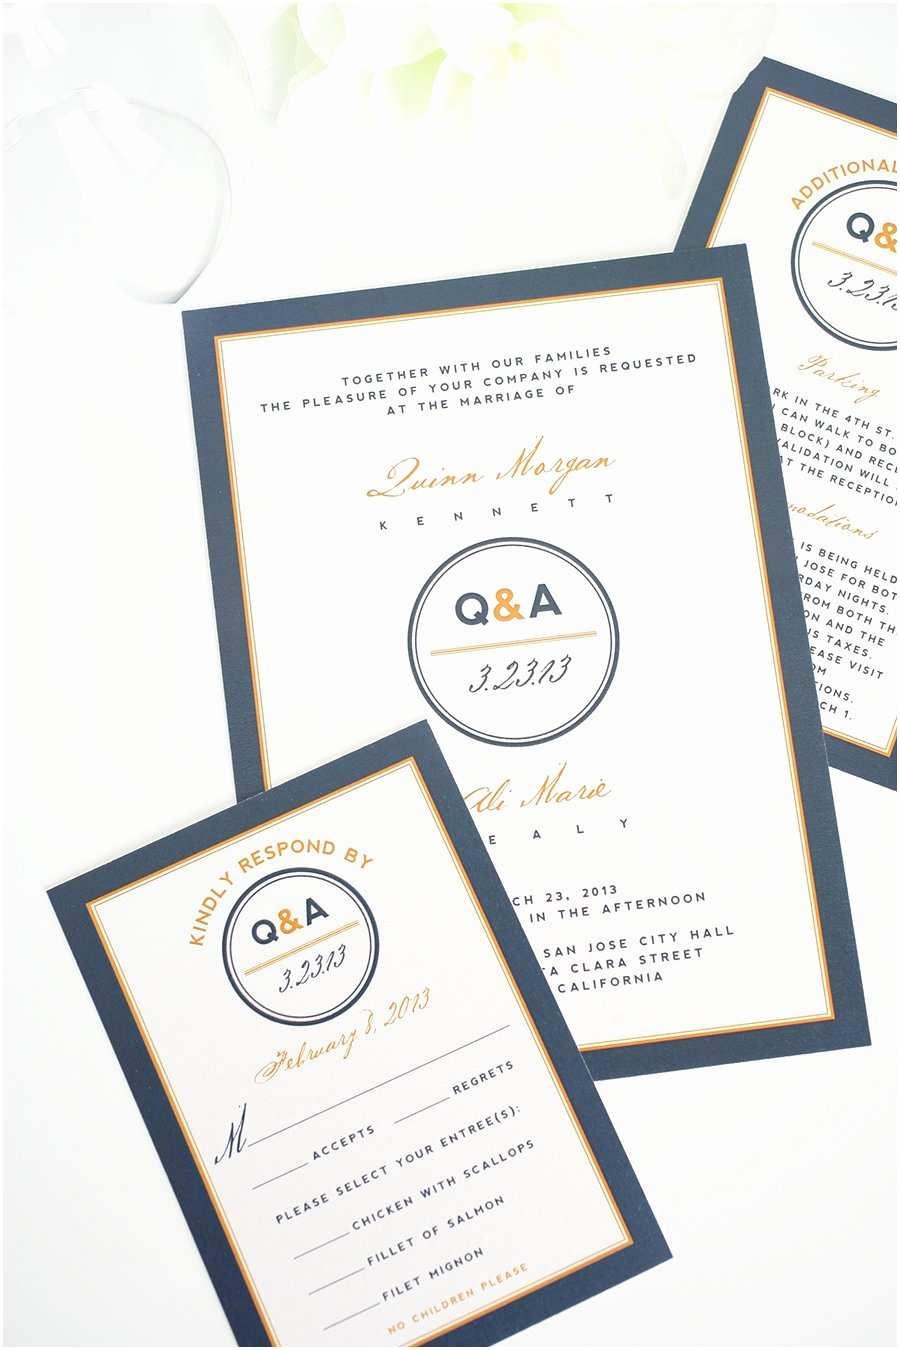 Contemporary Wedding Invitations Contemporary Wedding Invitations In Navy Blue And